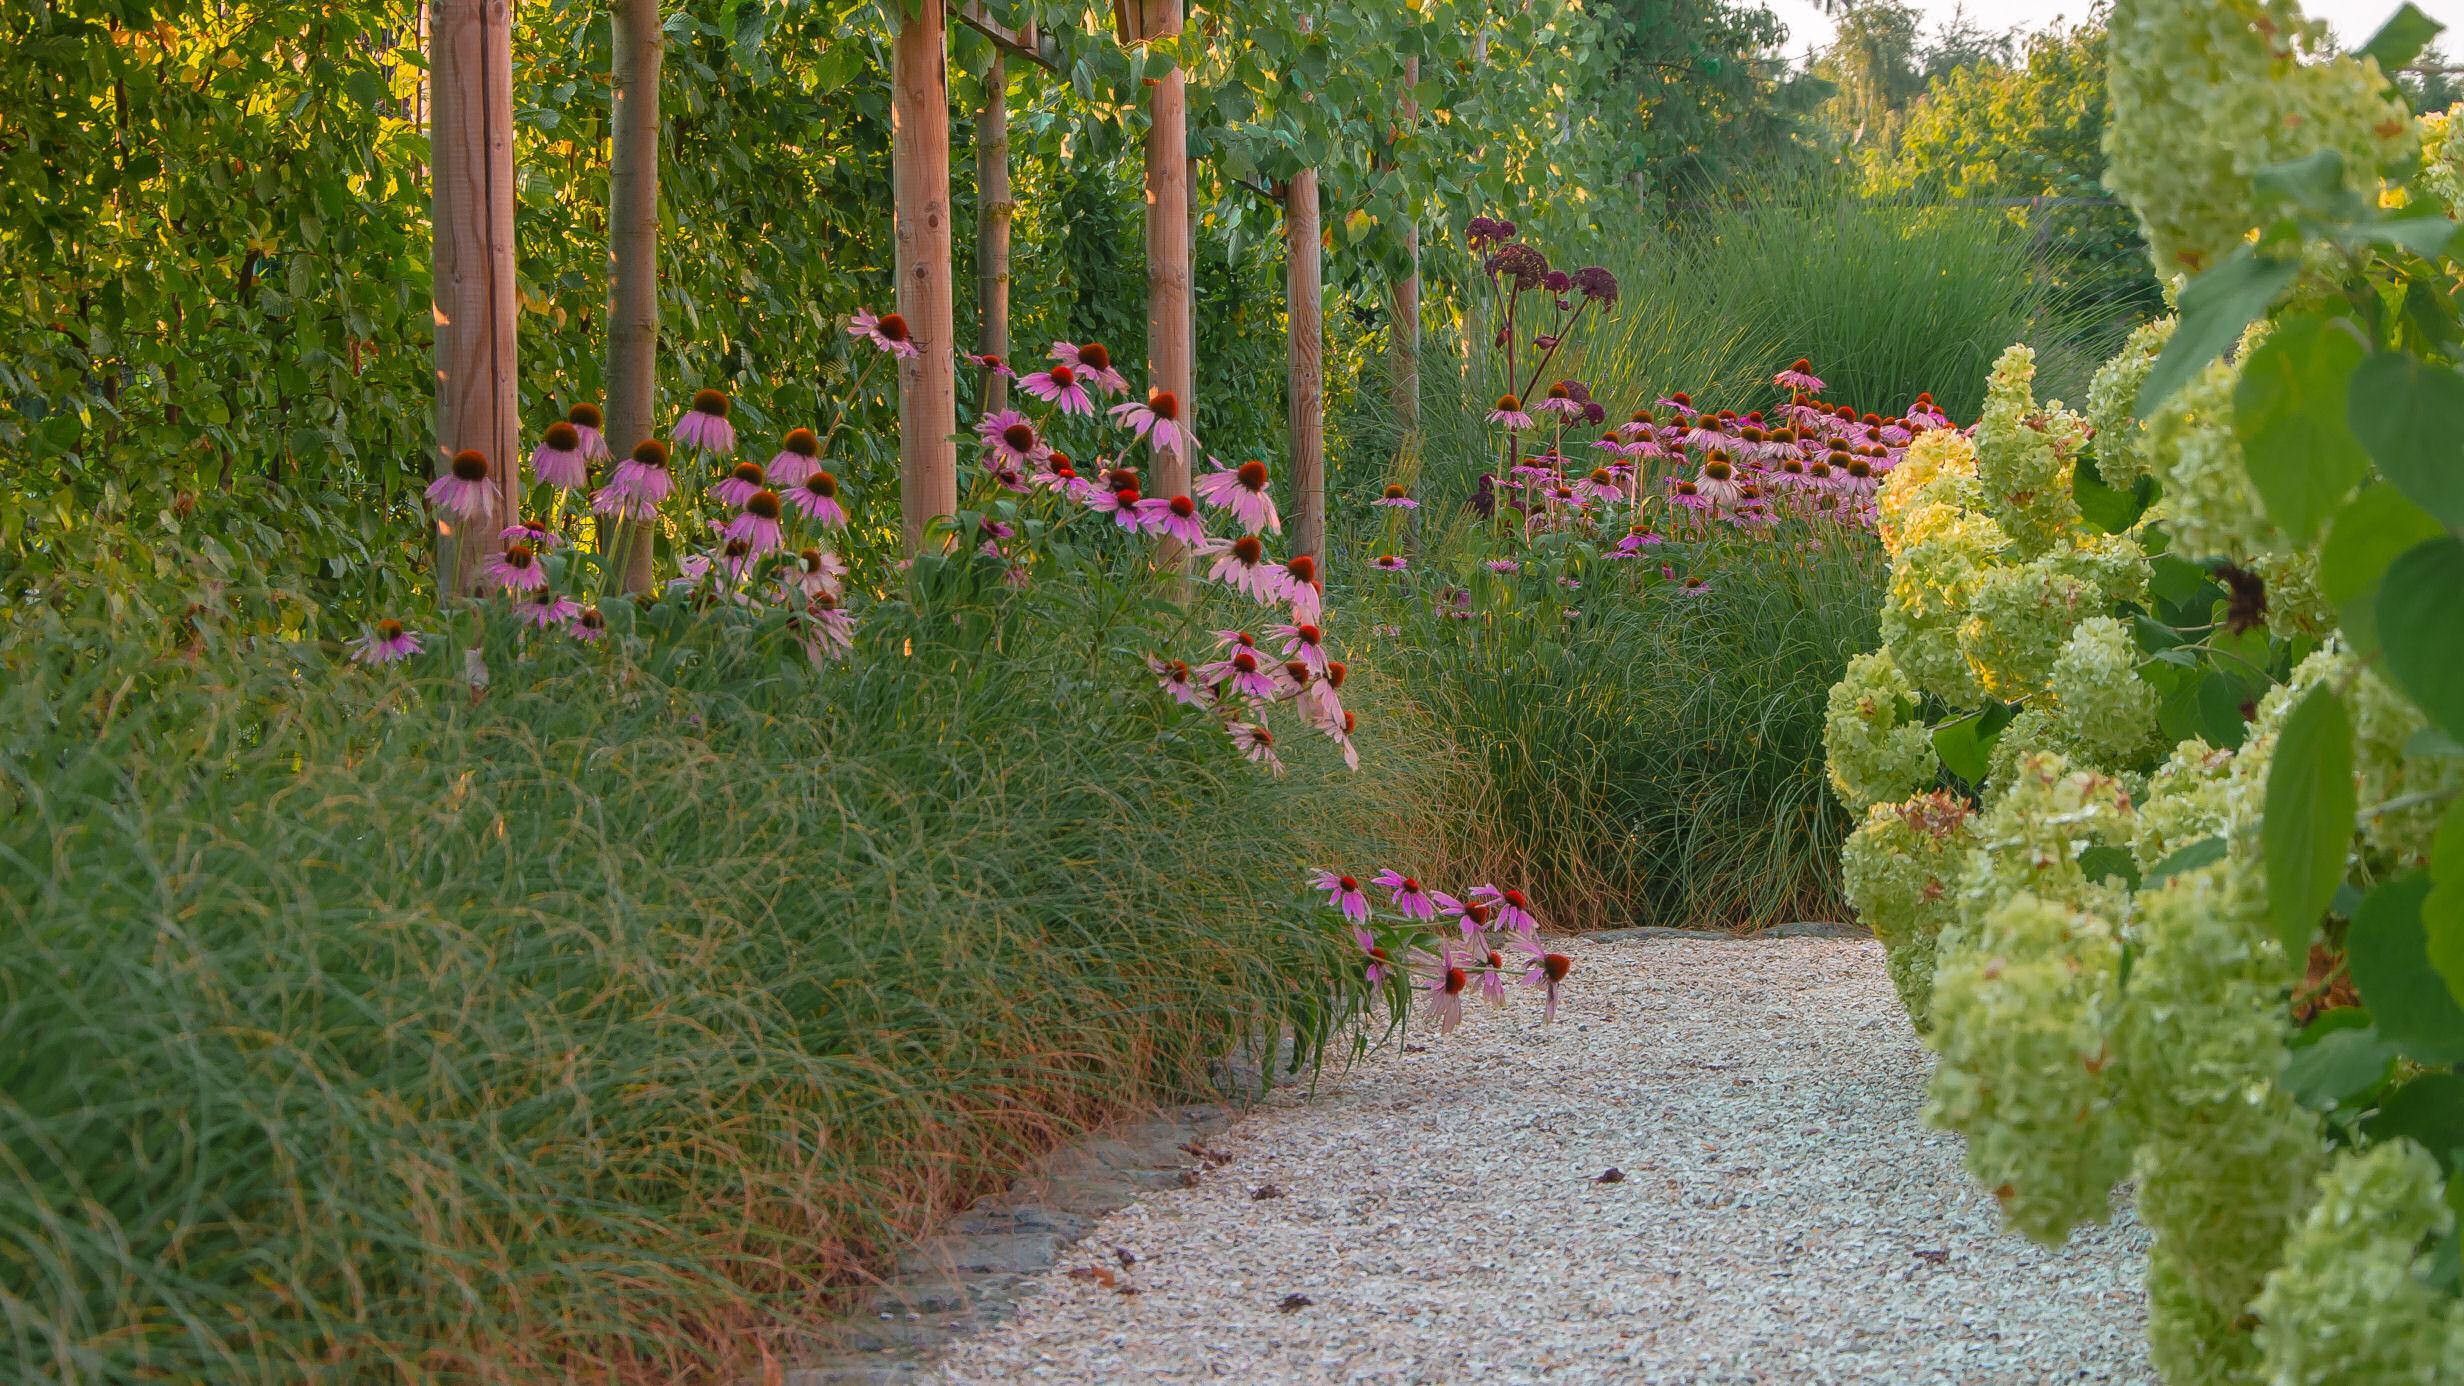 tuinpad, siergras, borderplant, hortensia, leilinde